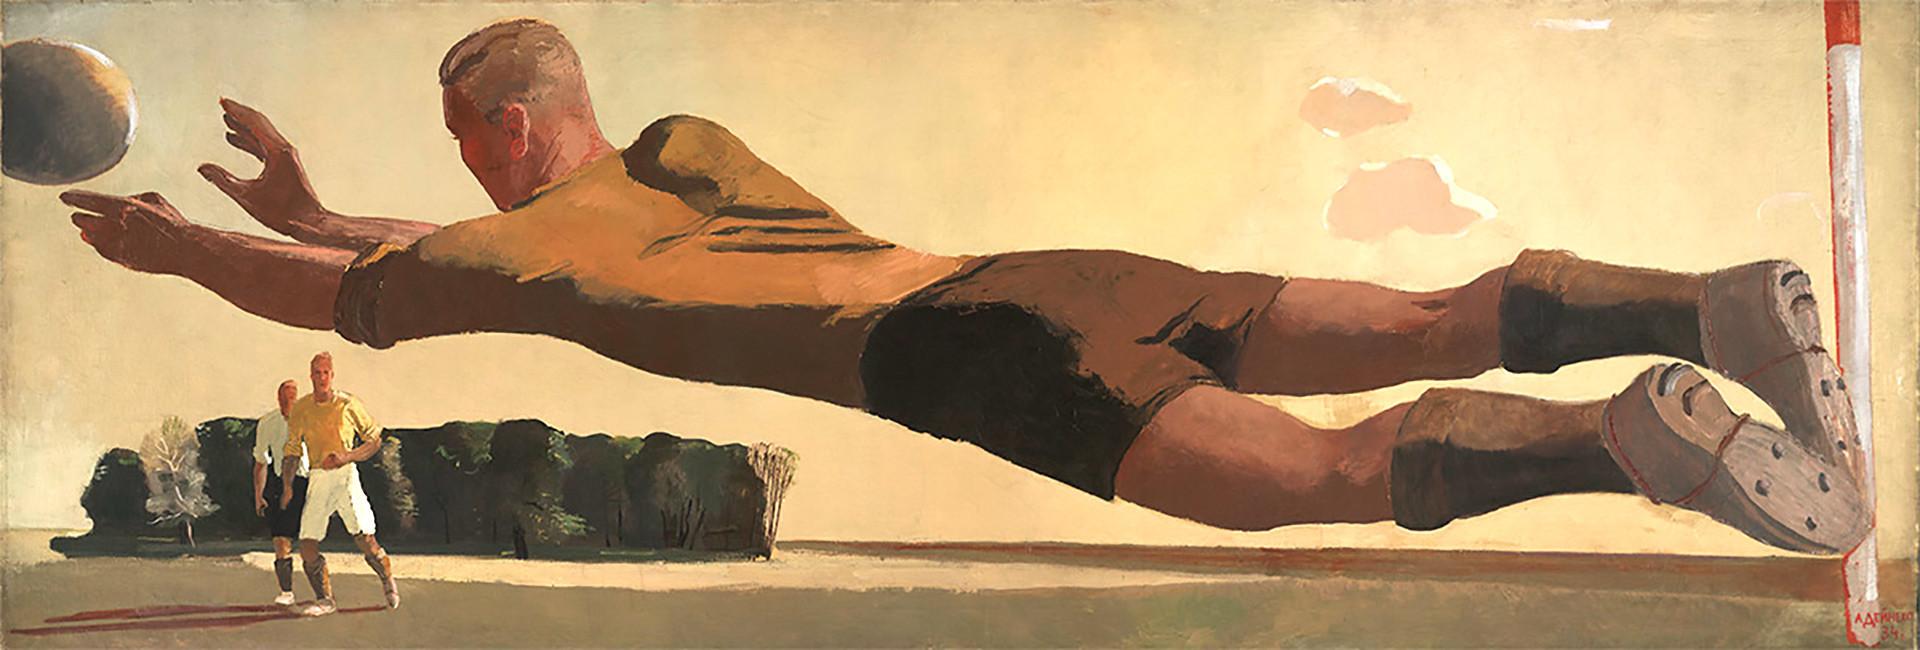 """Голман"" (1934), Александар Дејнека"